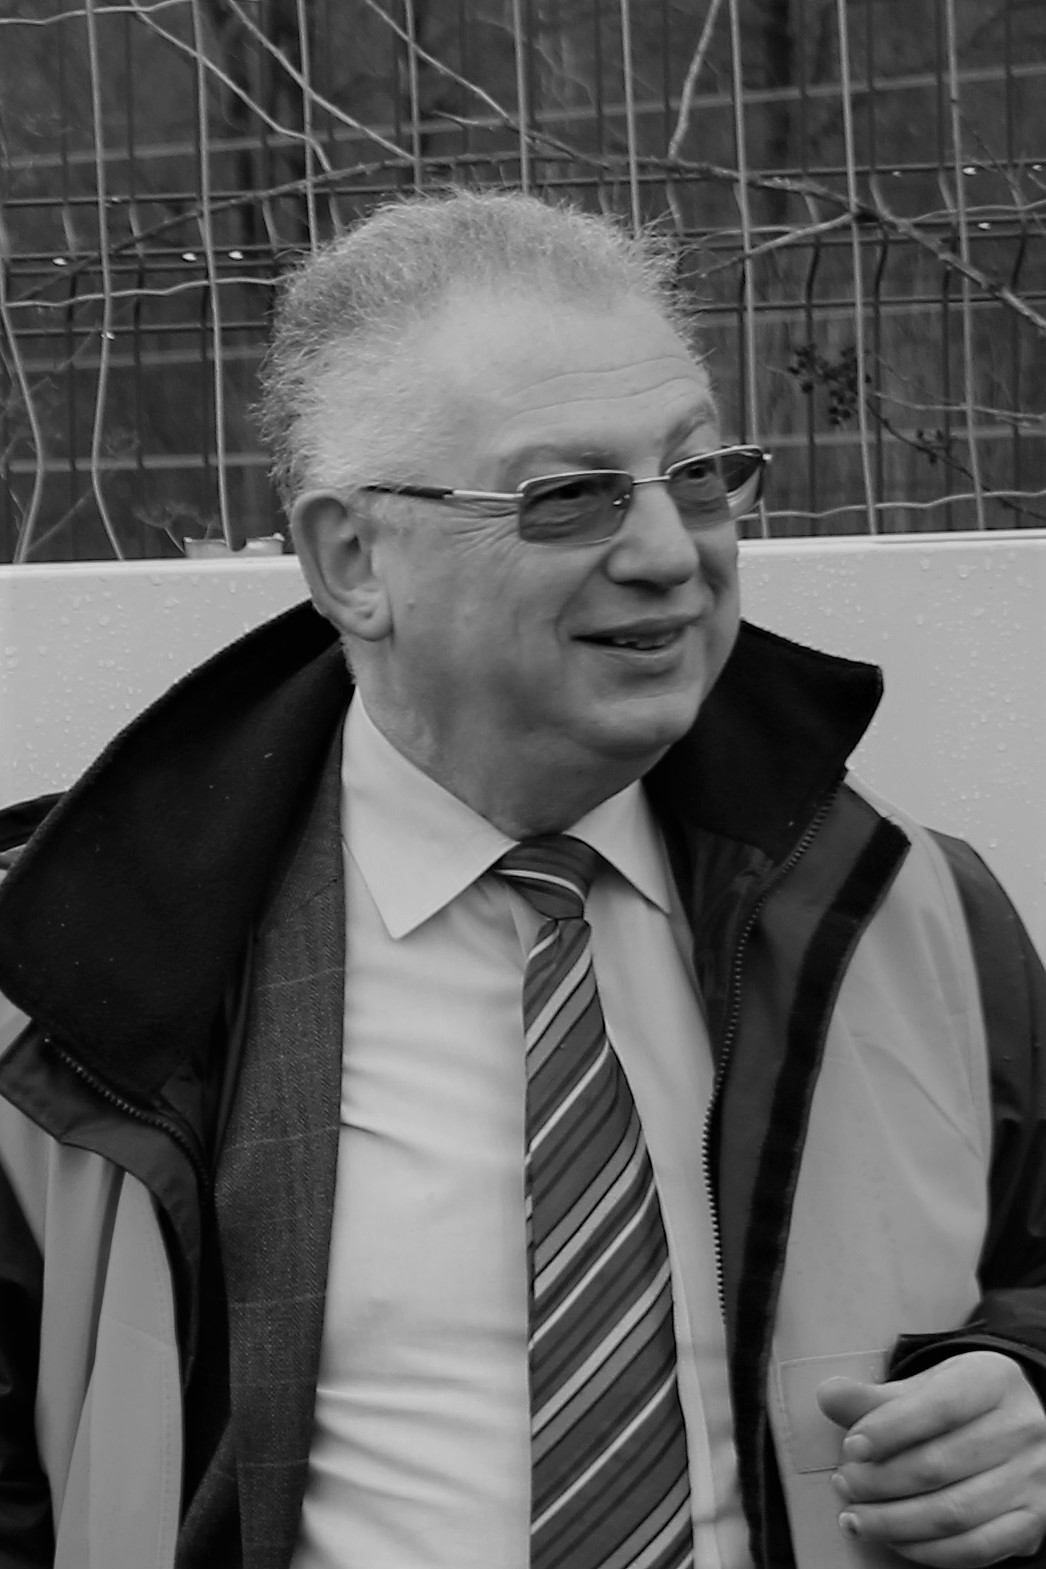 Jean-François SULZER